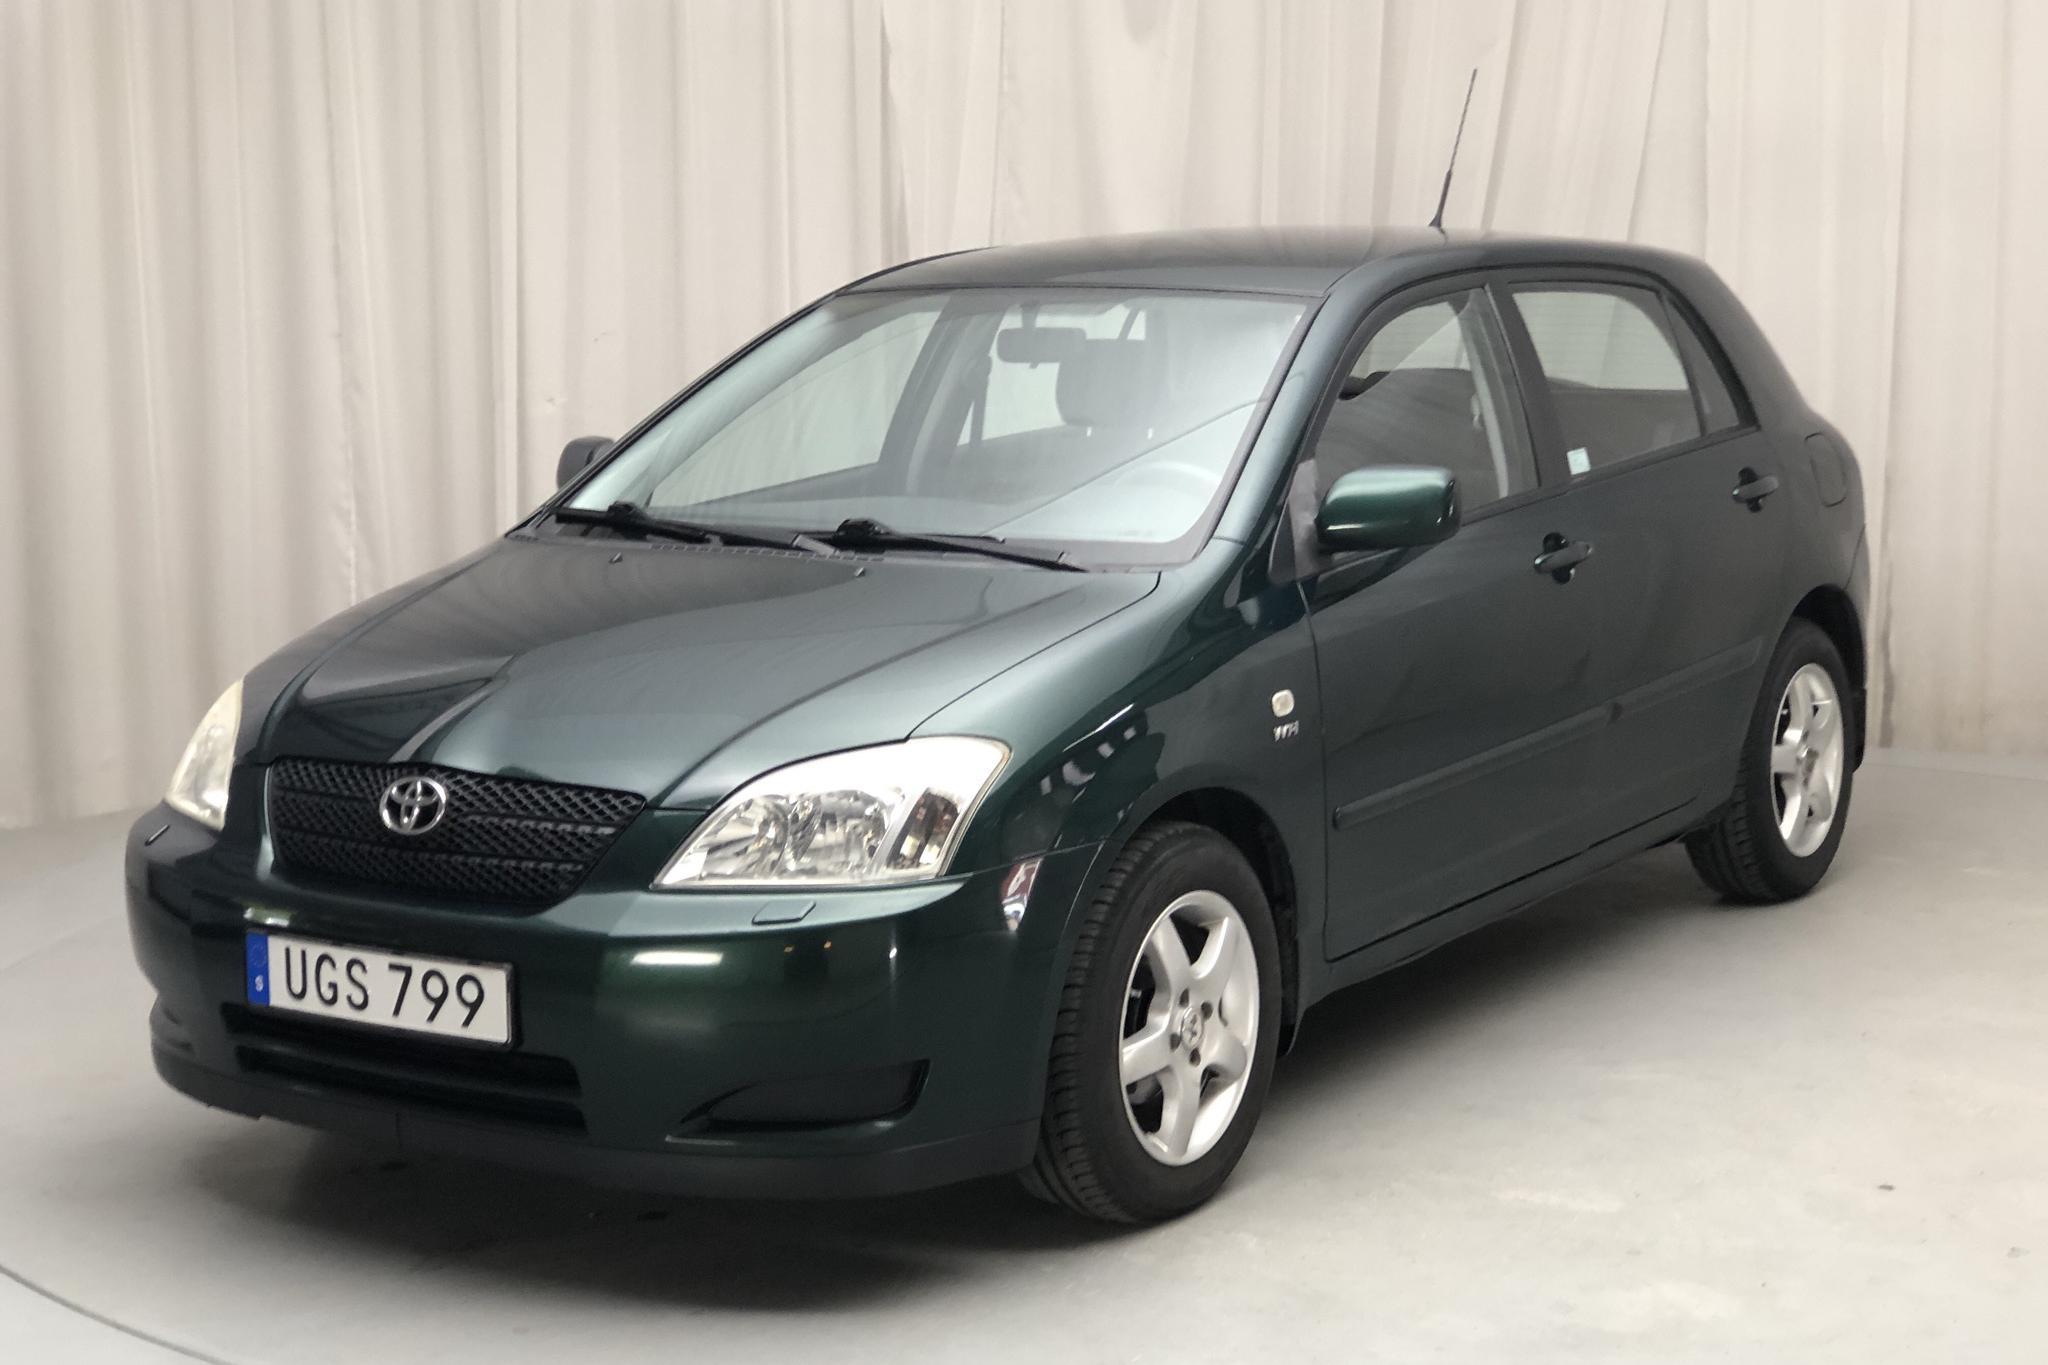 Toyota Corolla 1.4 5dr (97hk)